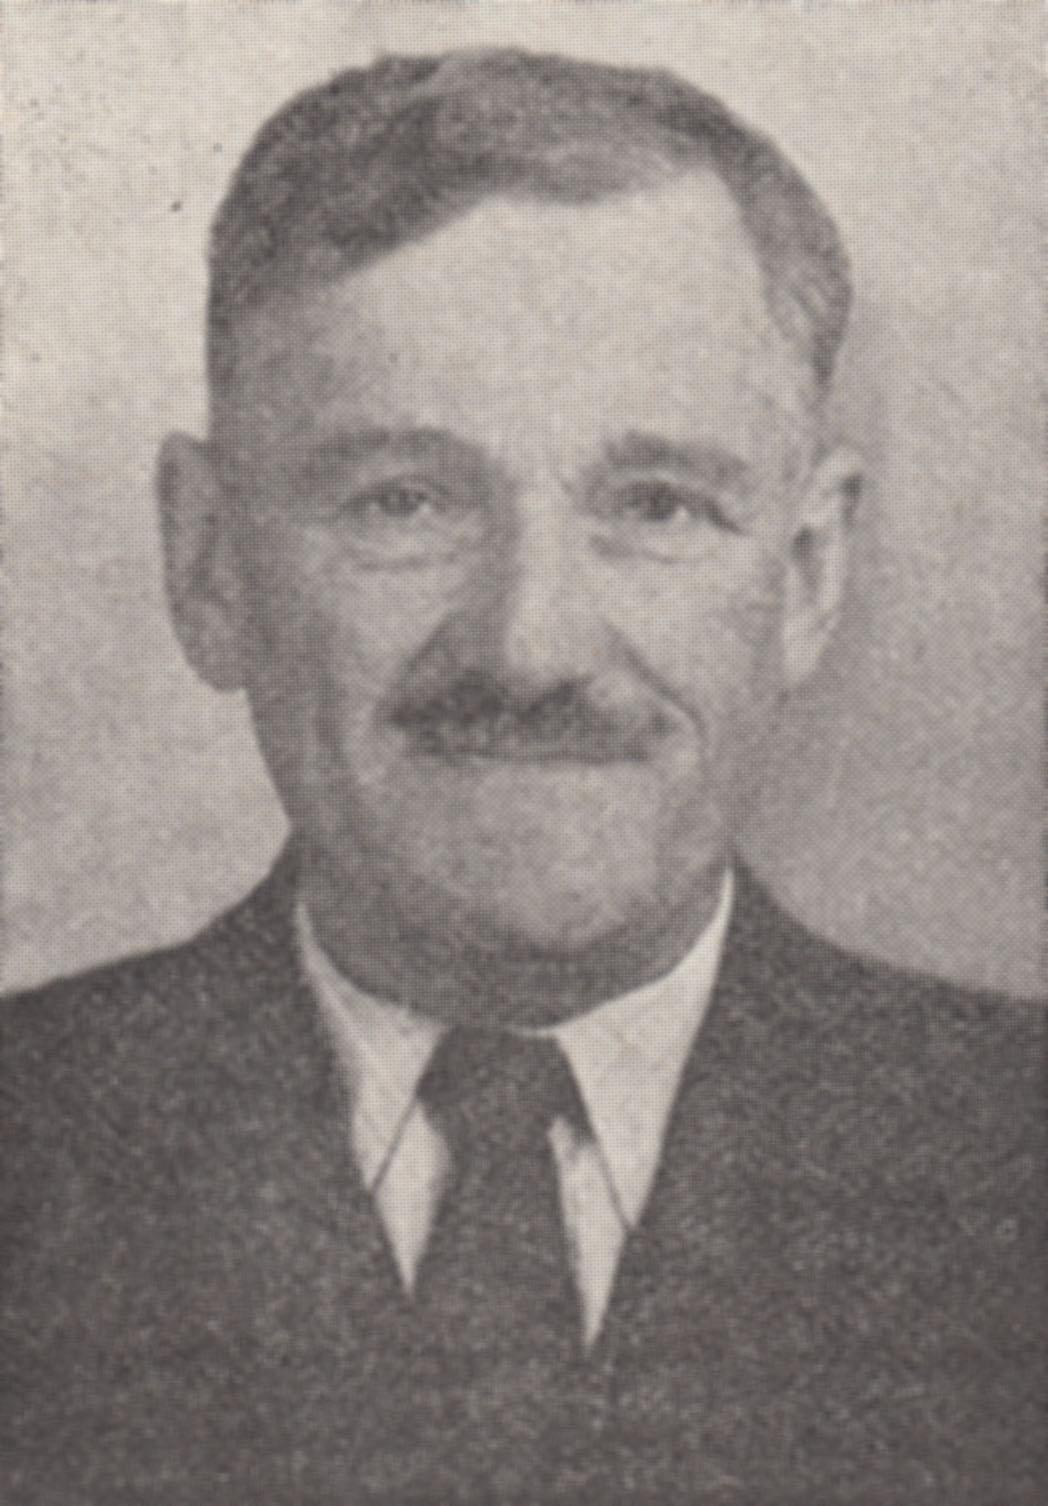 Johann Kolb-Heeb